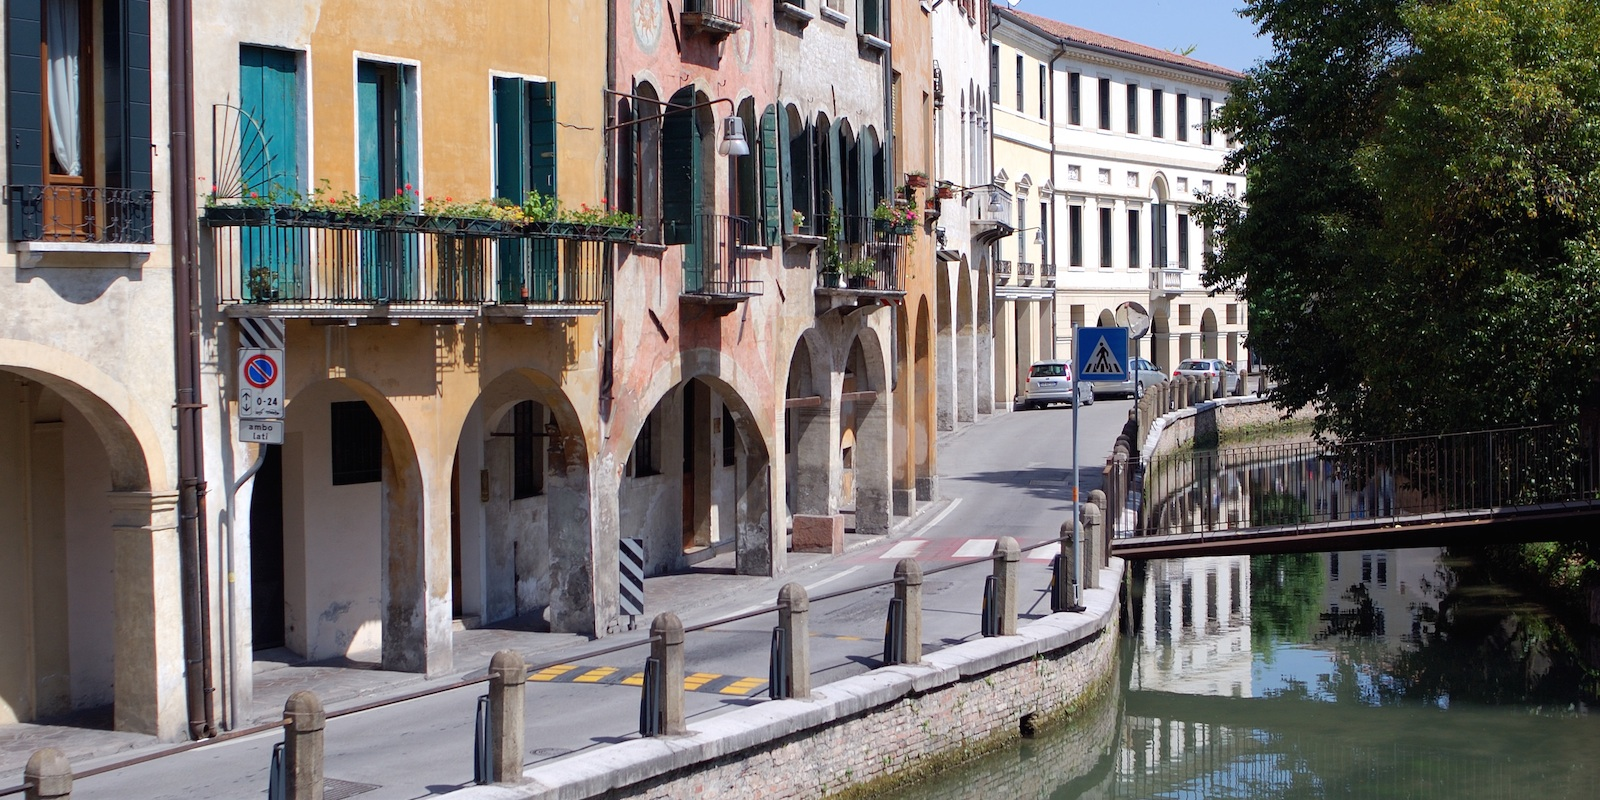 Treviso's guide